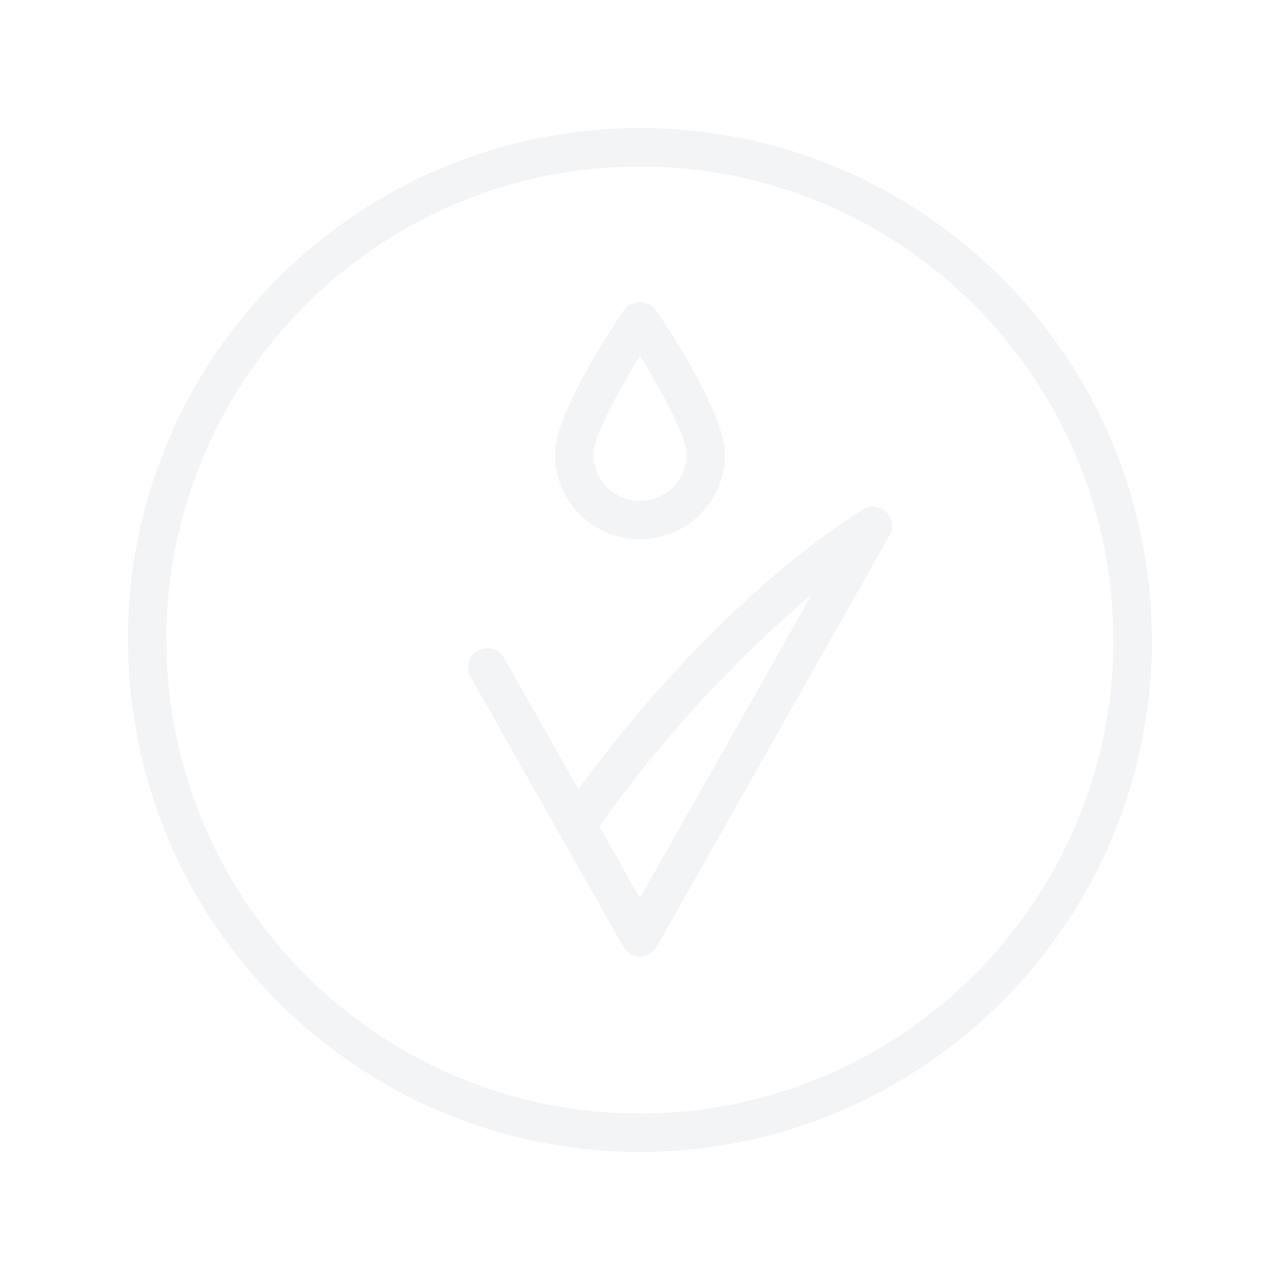 GLO SKIN BEAUTY Precision Eye Pencil 1.1g